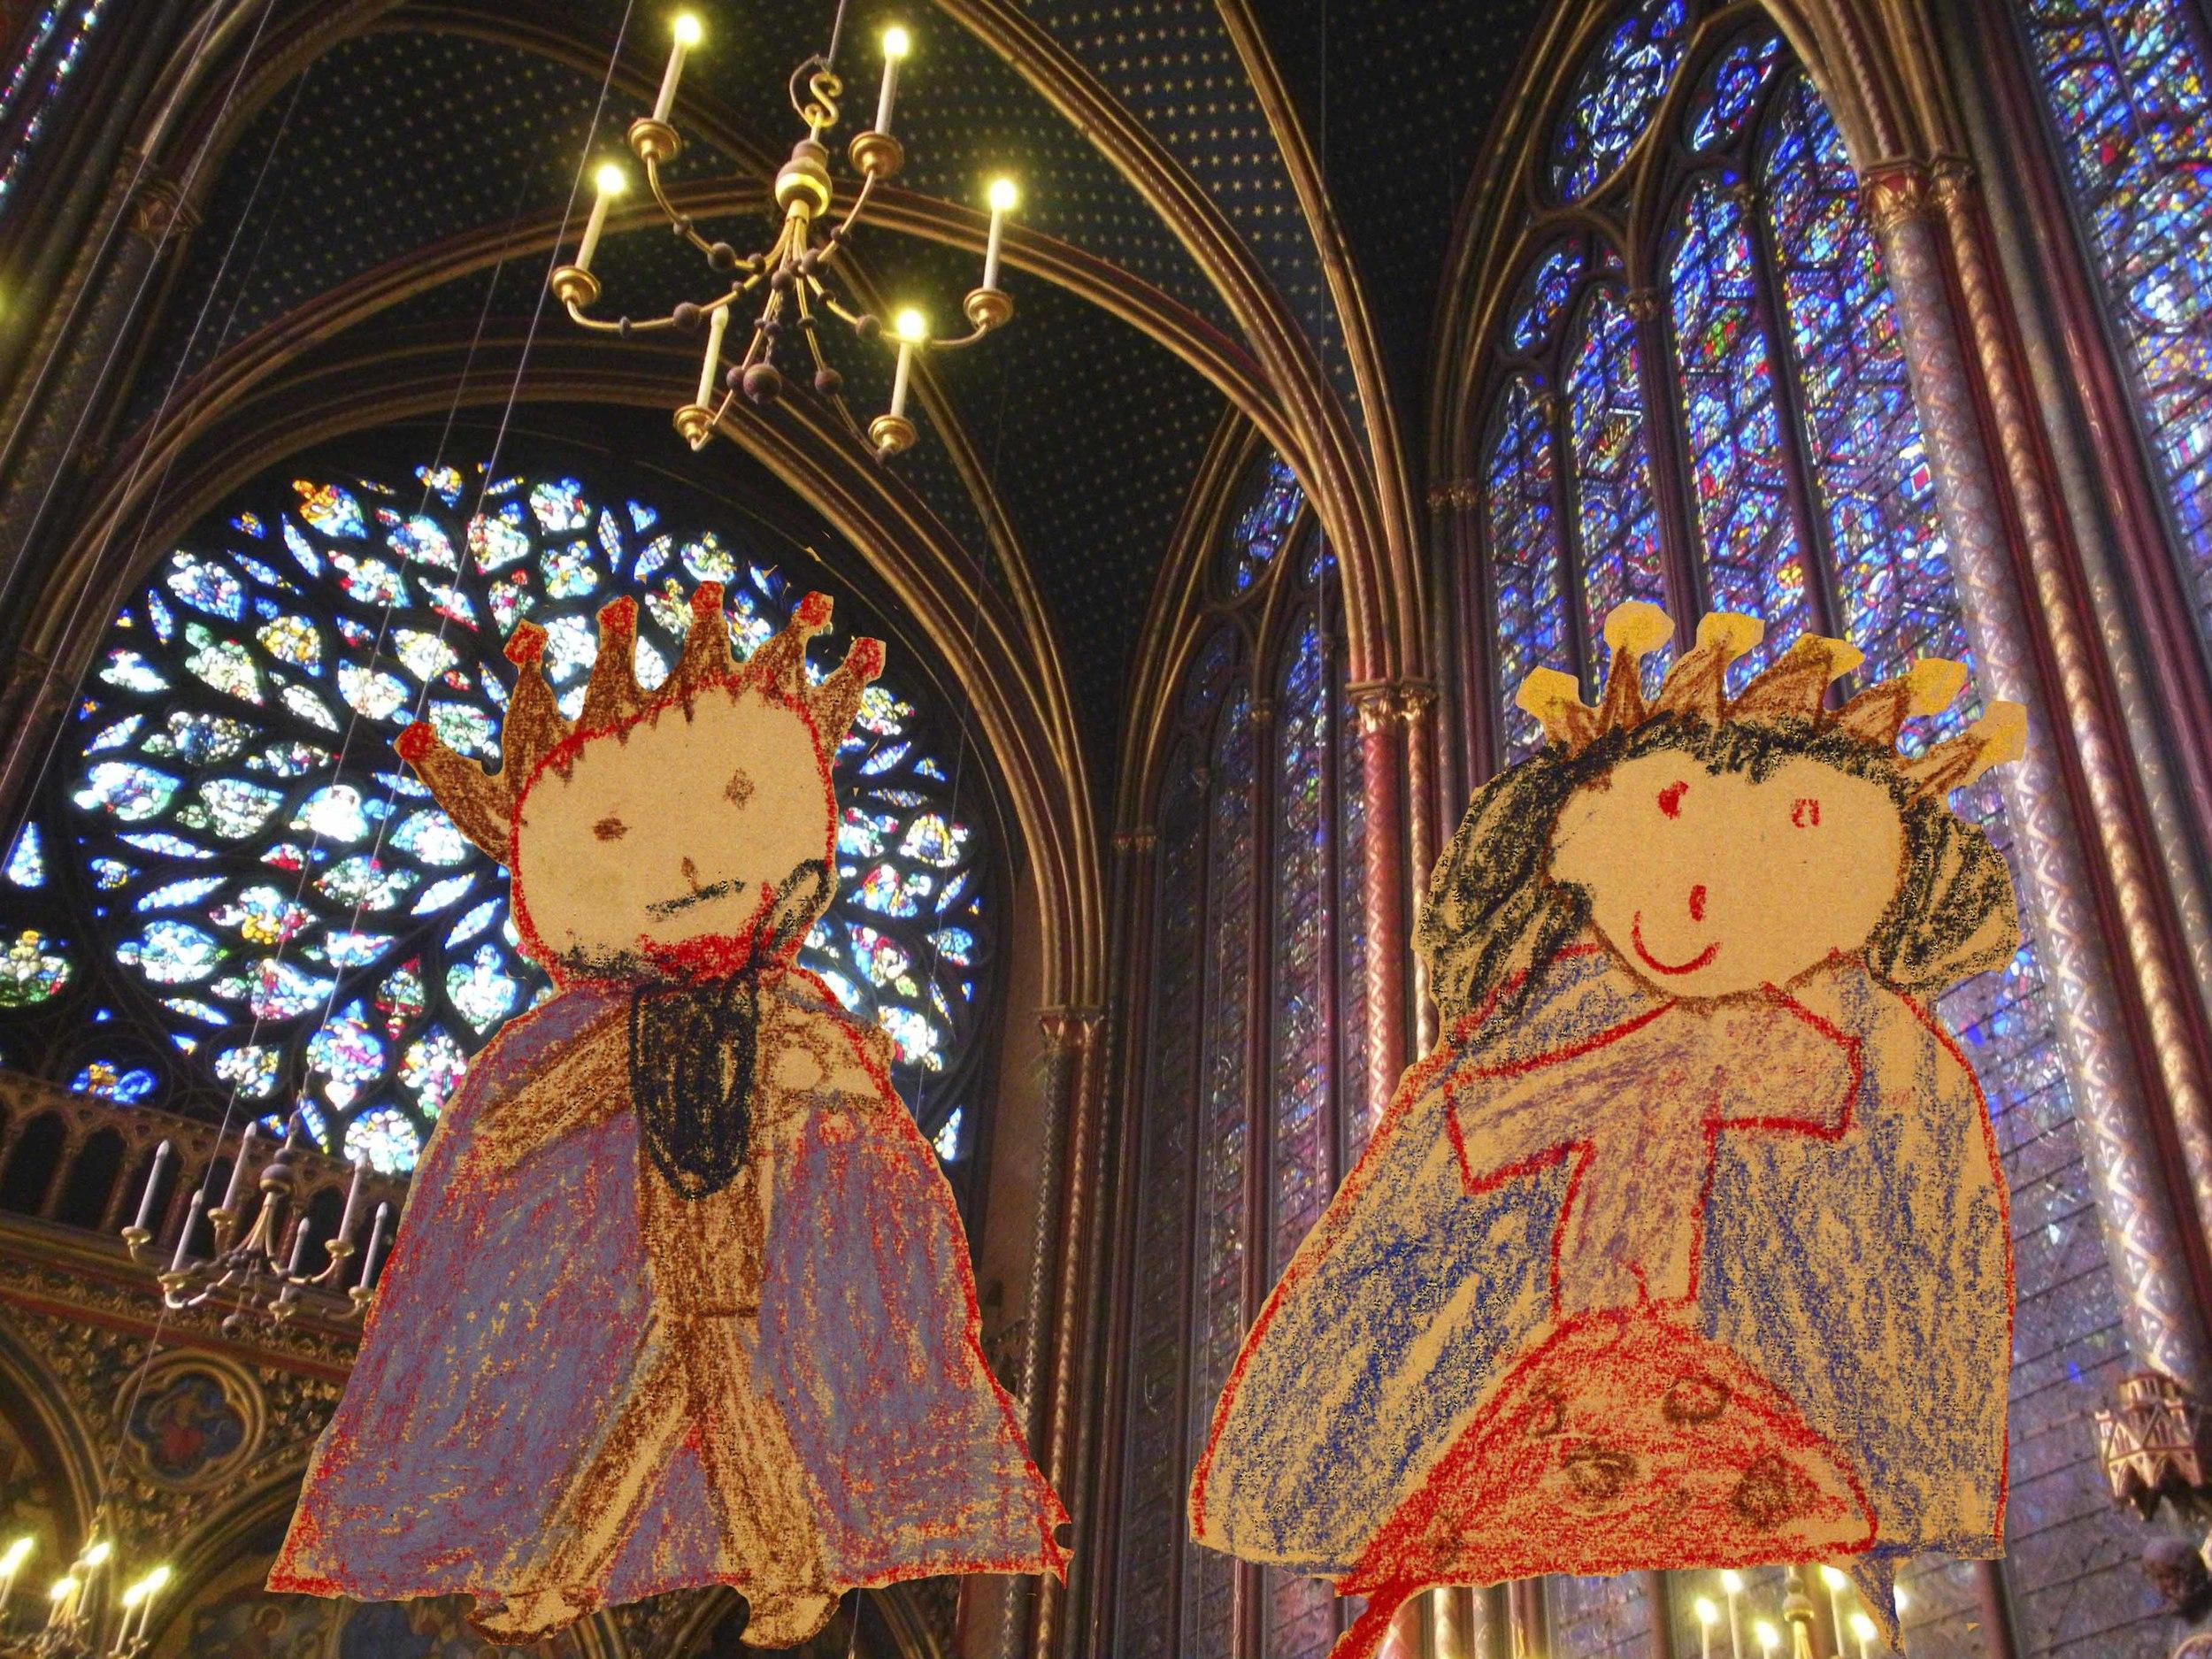 Low Res Parisian King & Queen.jpg